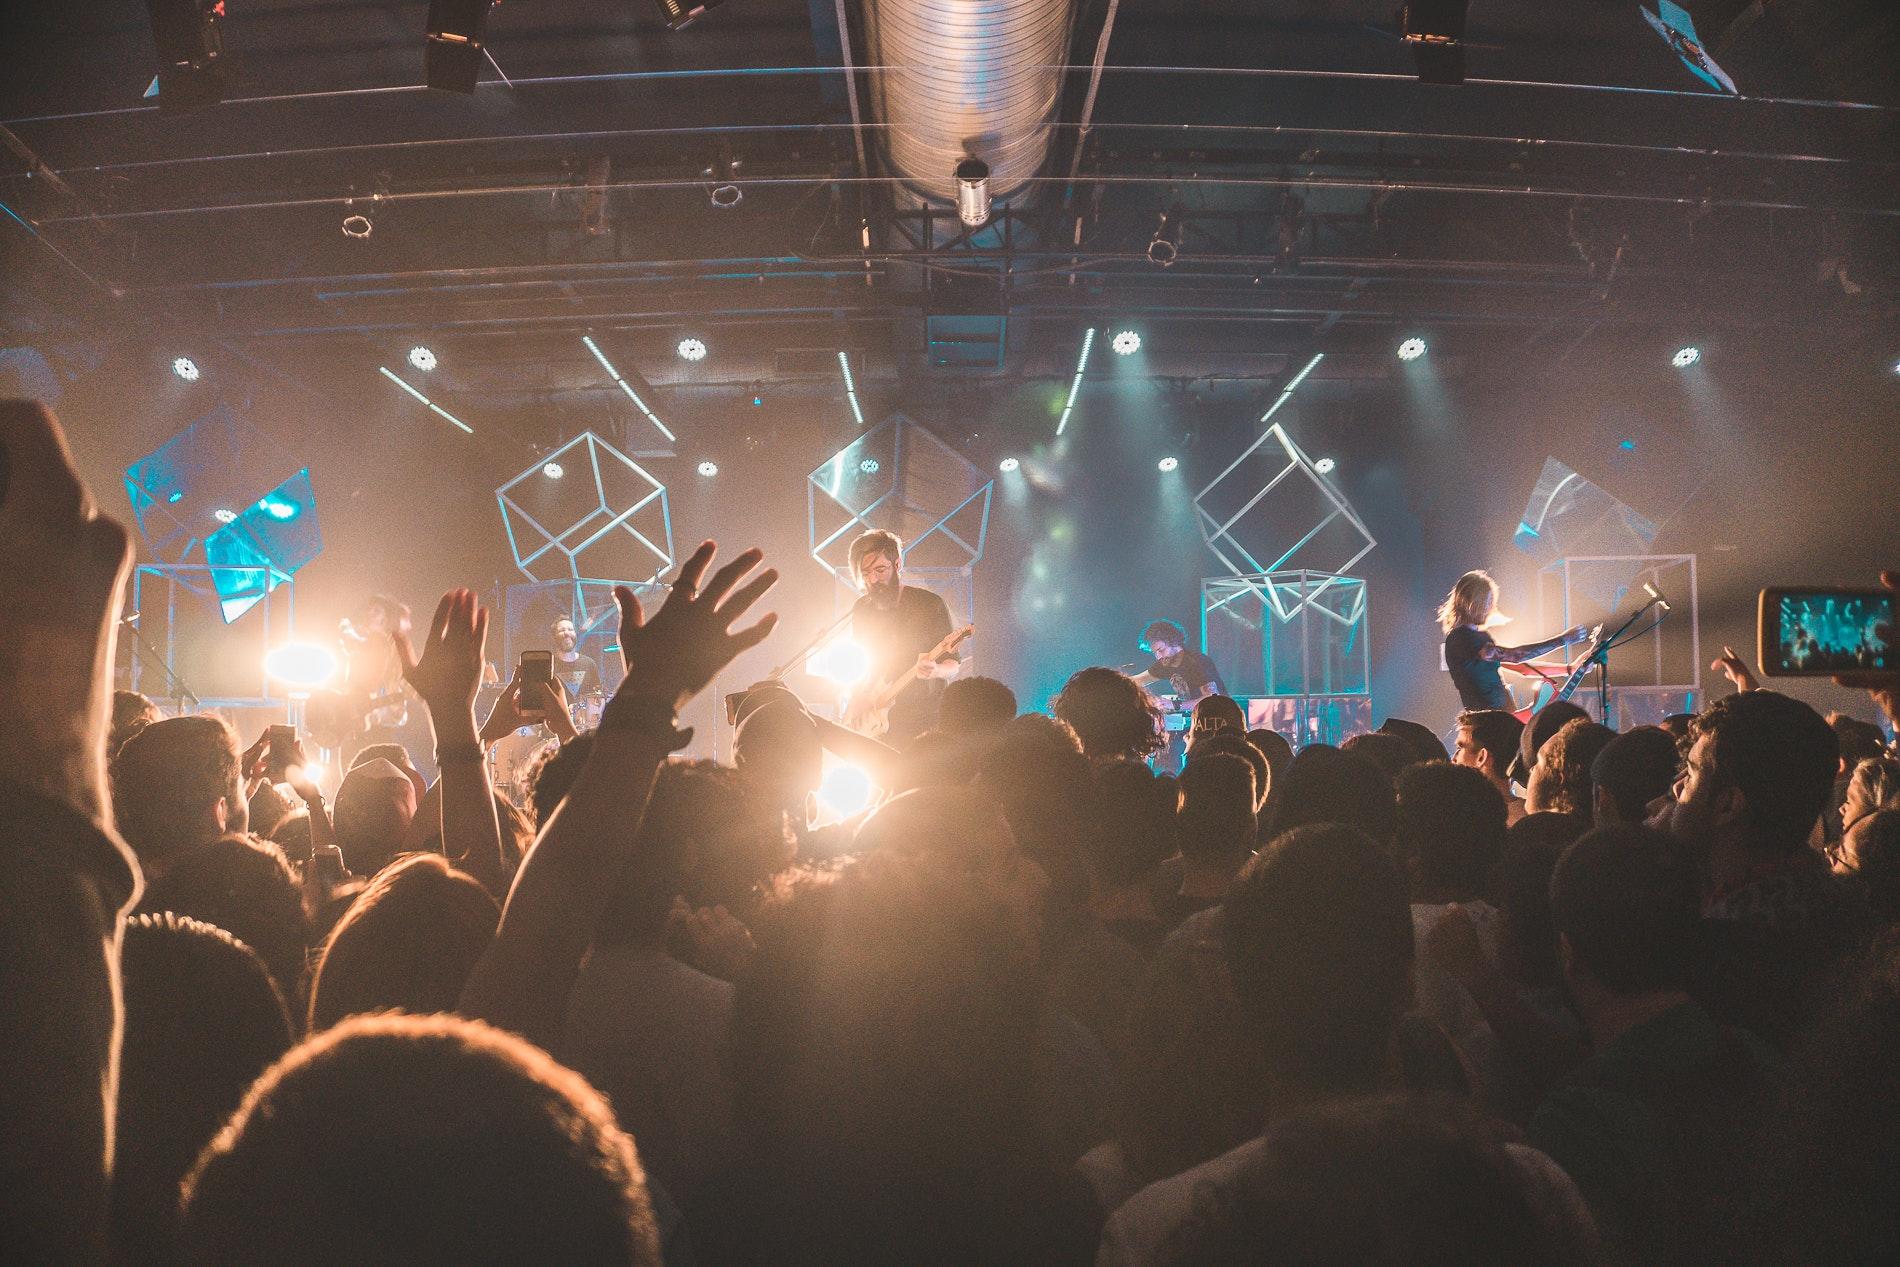 hyped-up-concert.jpg